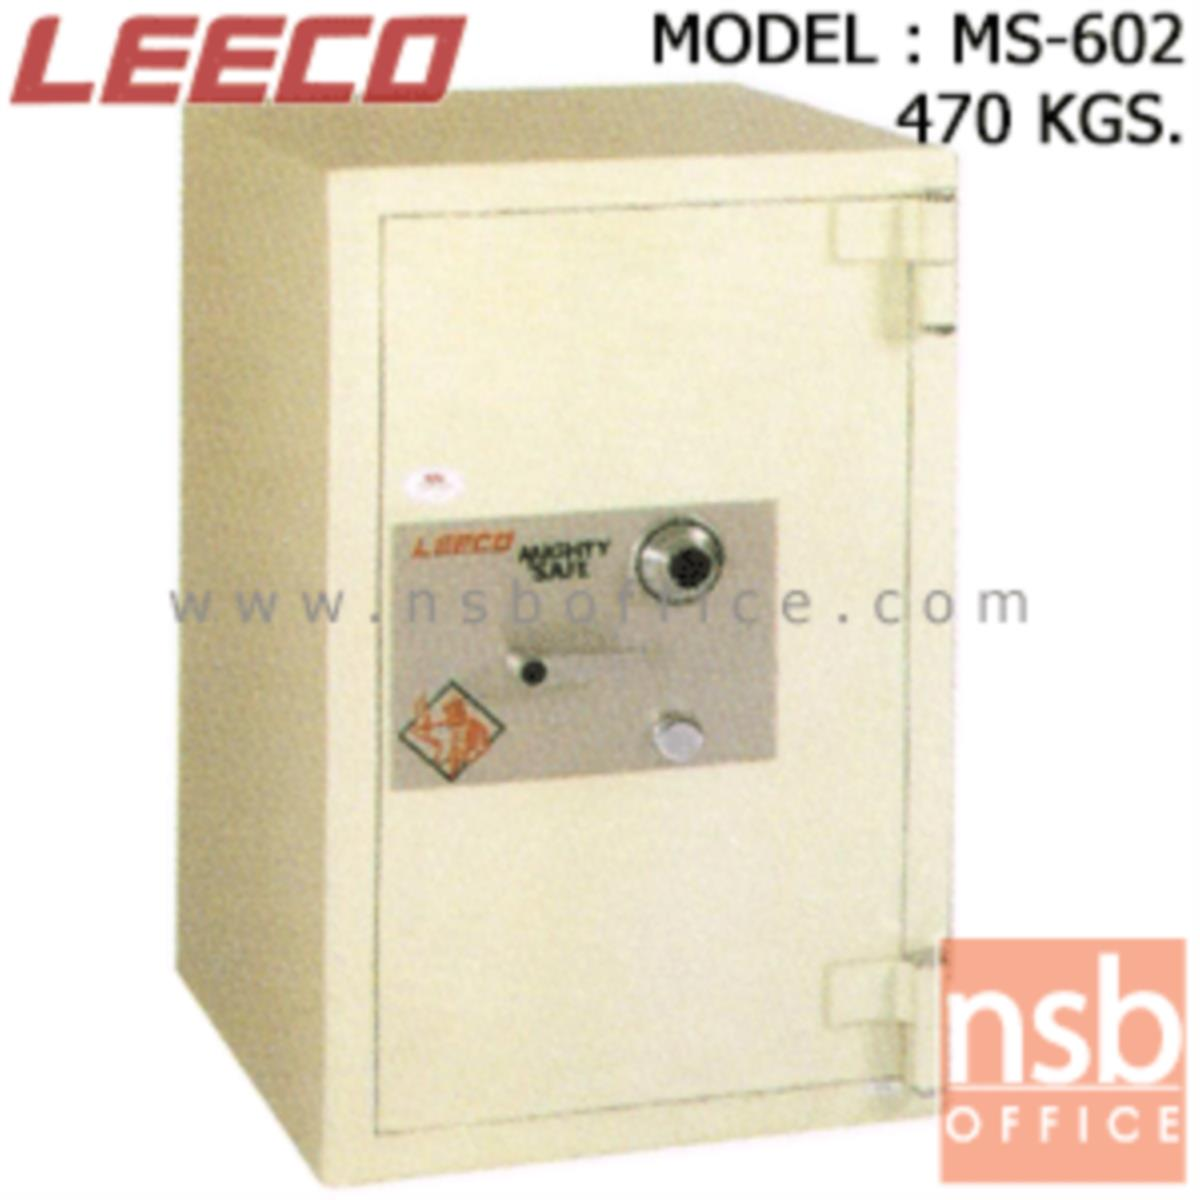 F02A019:ตู้เซฟนิรภัย 470 กก. ลีโก้ รุ่น LEECO-MS-602 มี 1 กุญแจ 1 รหัส (เปลี่ยนรหัสไม่ได้)